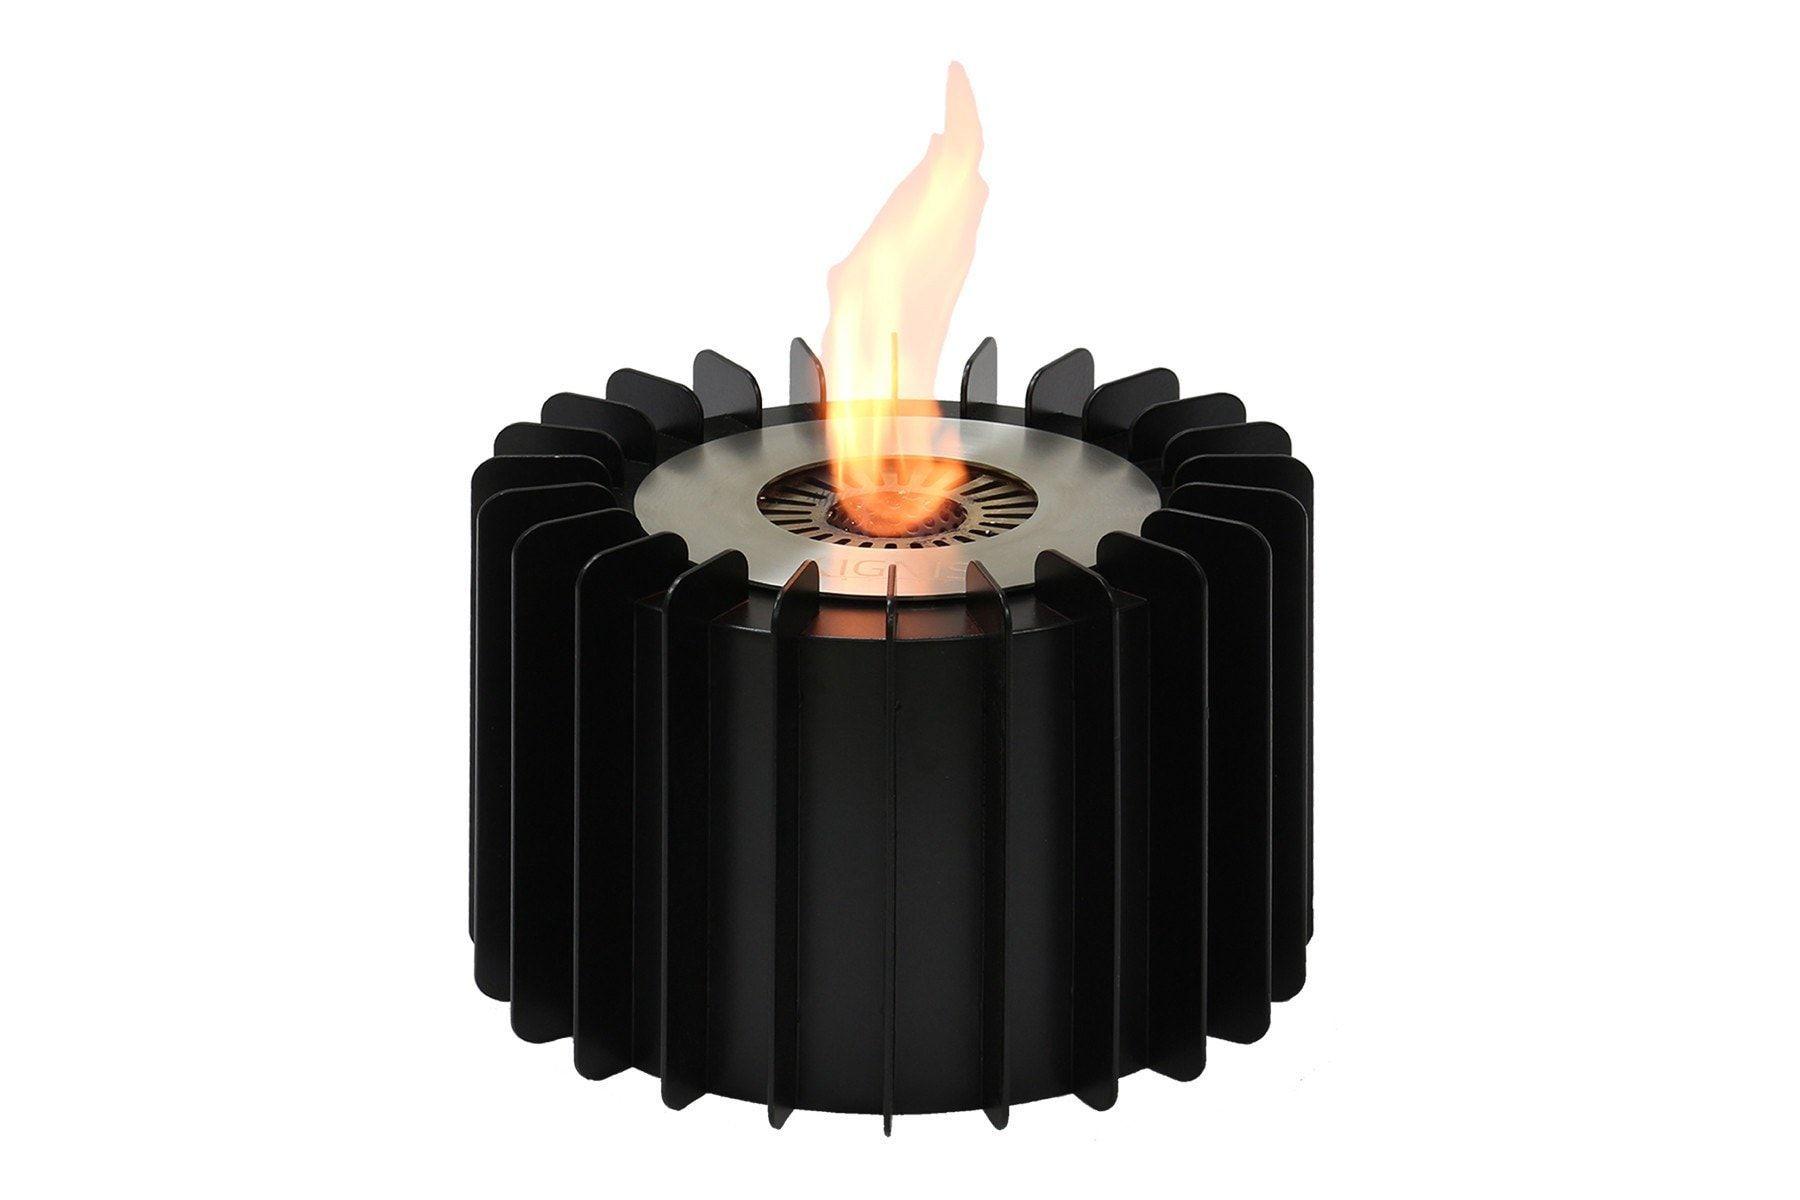 ignis ebg150 round ethanol fireplace grate 9 5 ethanol fireplace